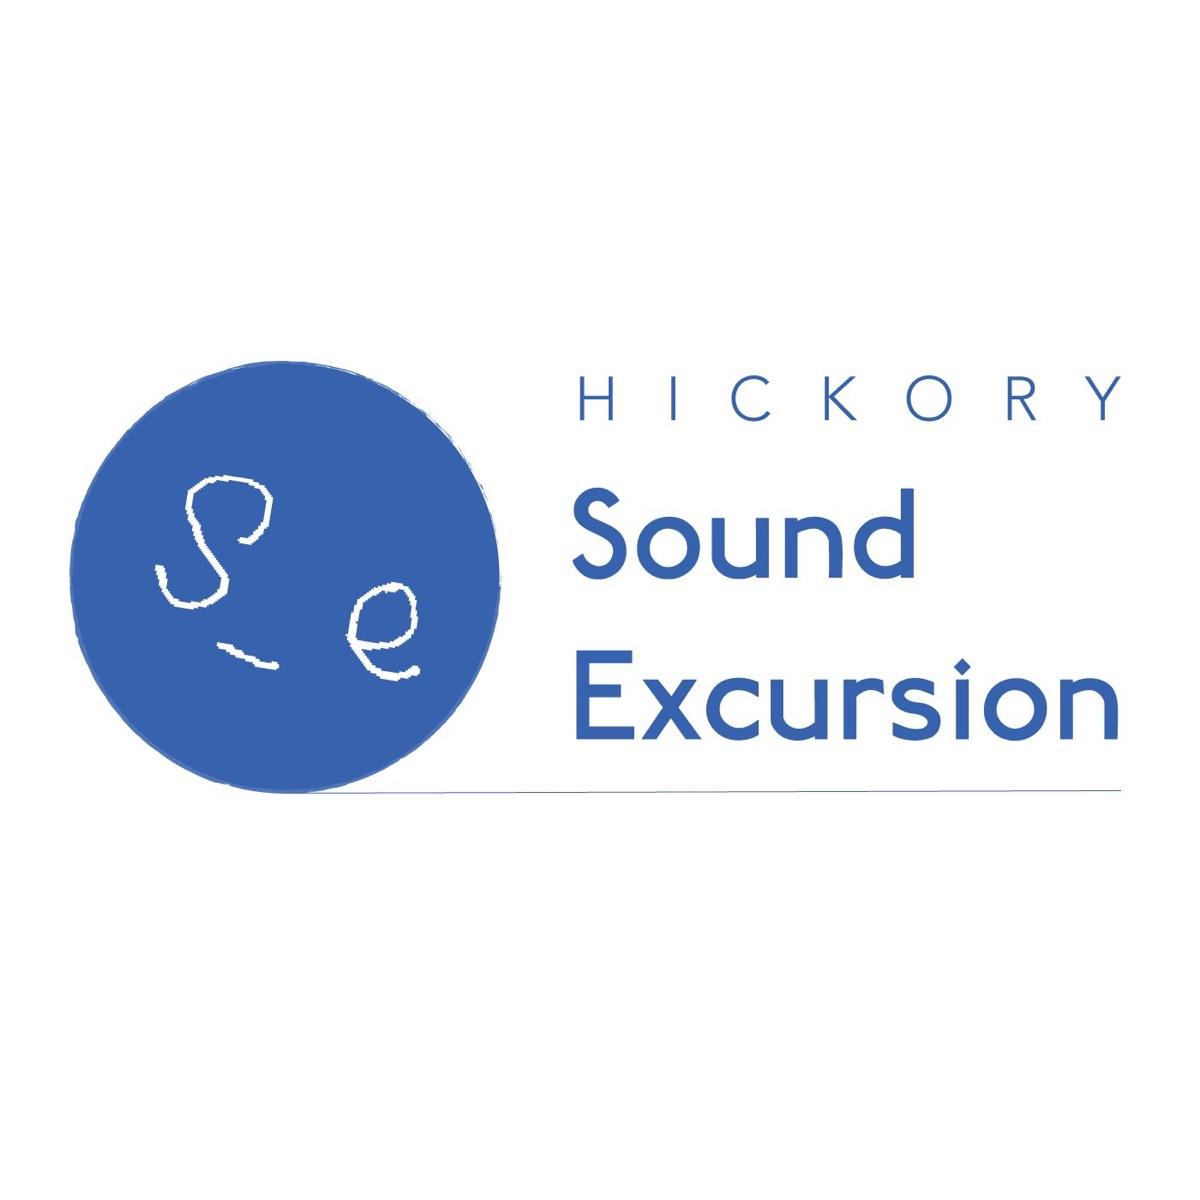 Hickory Sound Excursion